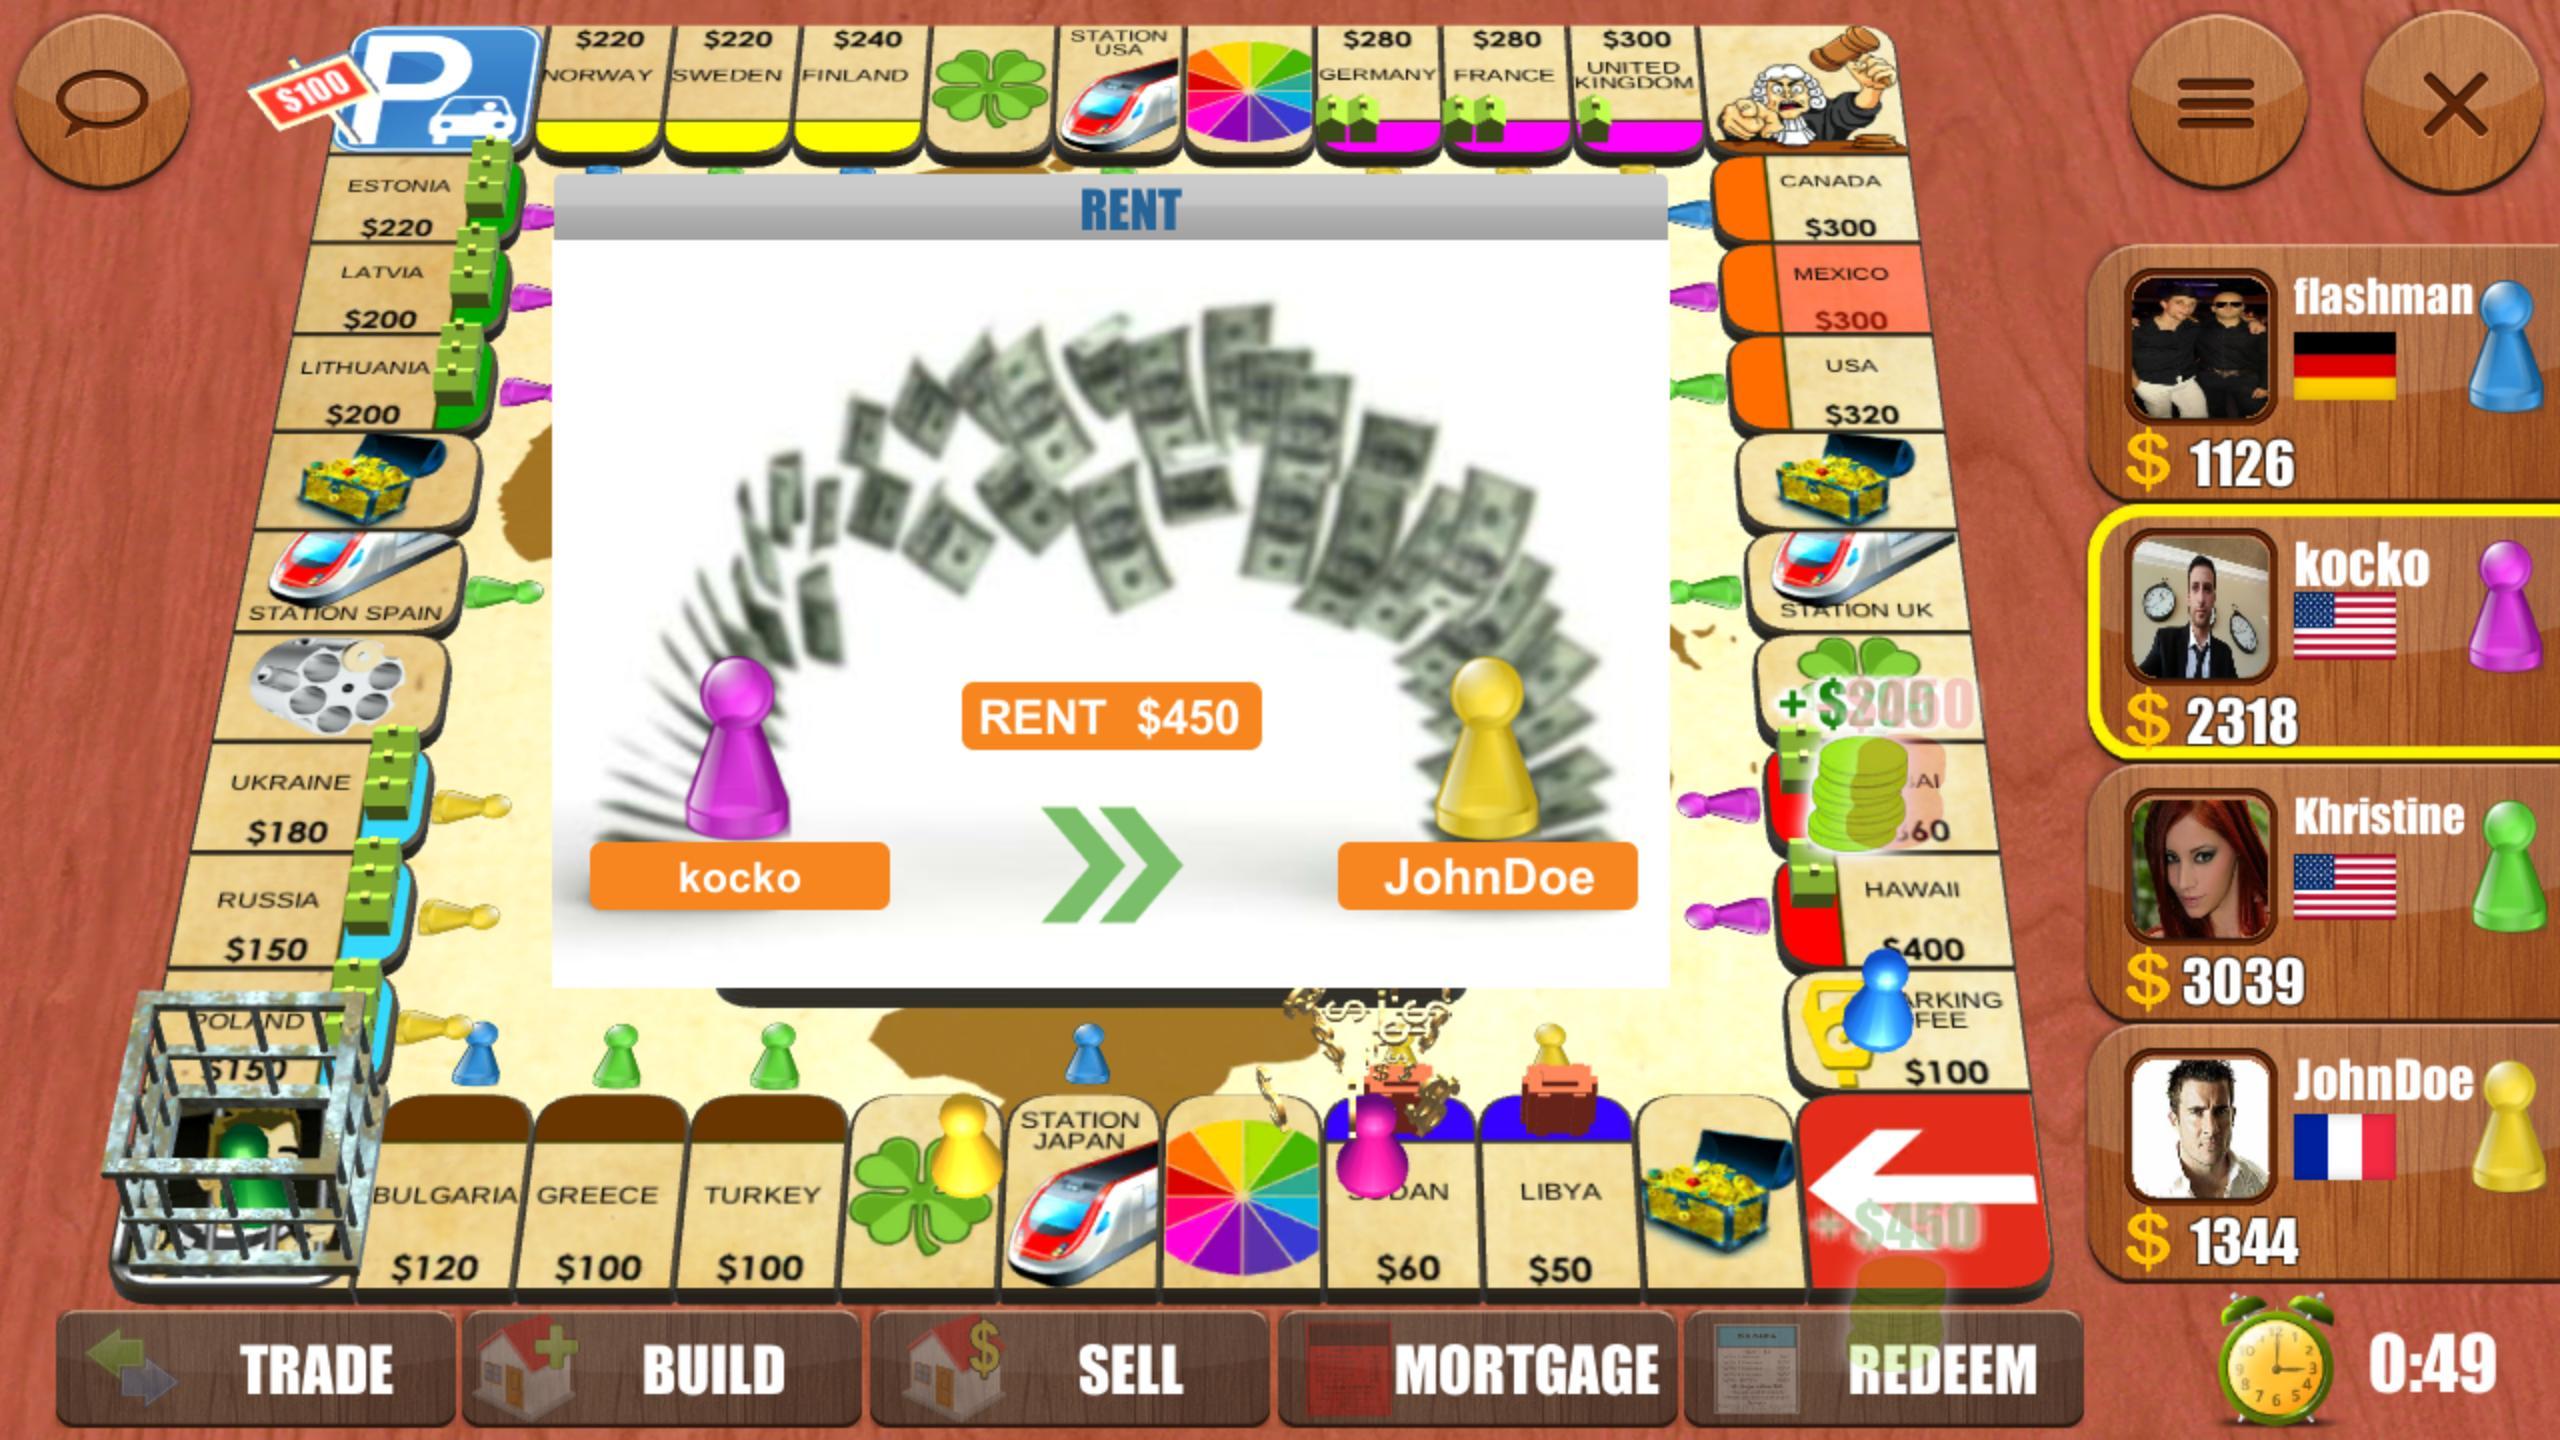 Rento Dice Board Game Online 5.1.9 Screenshot 2